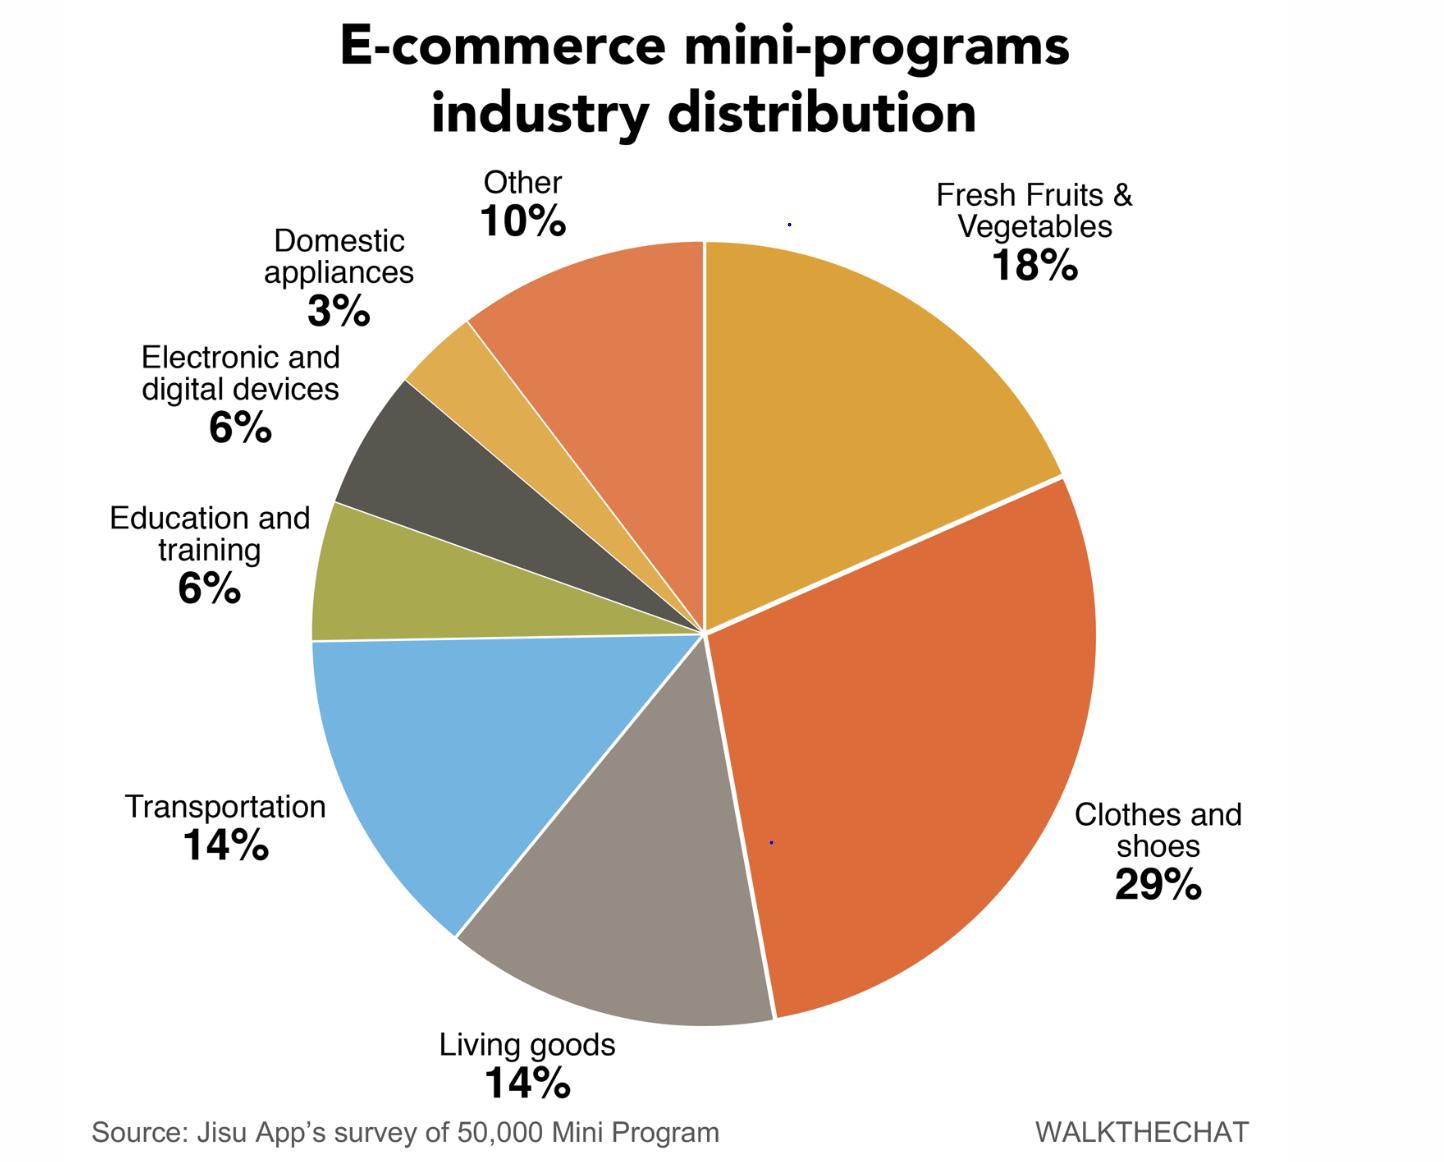 ecommerce mini programs industry distribution in WeChat super app